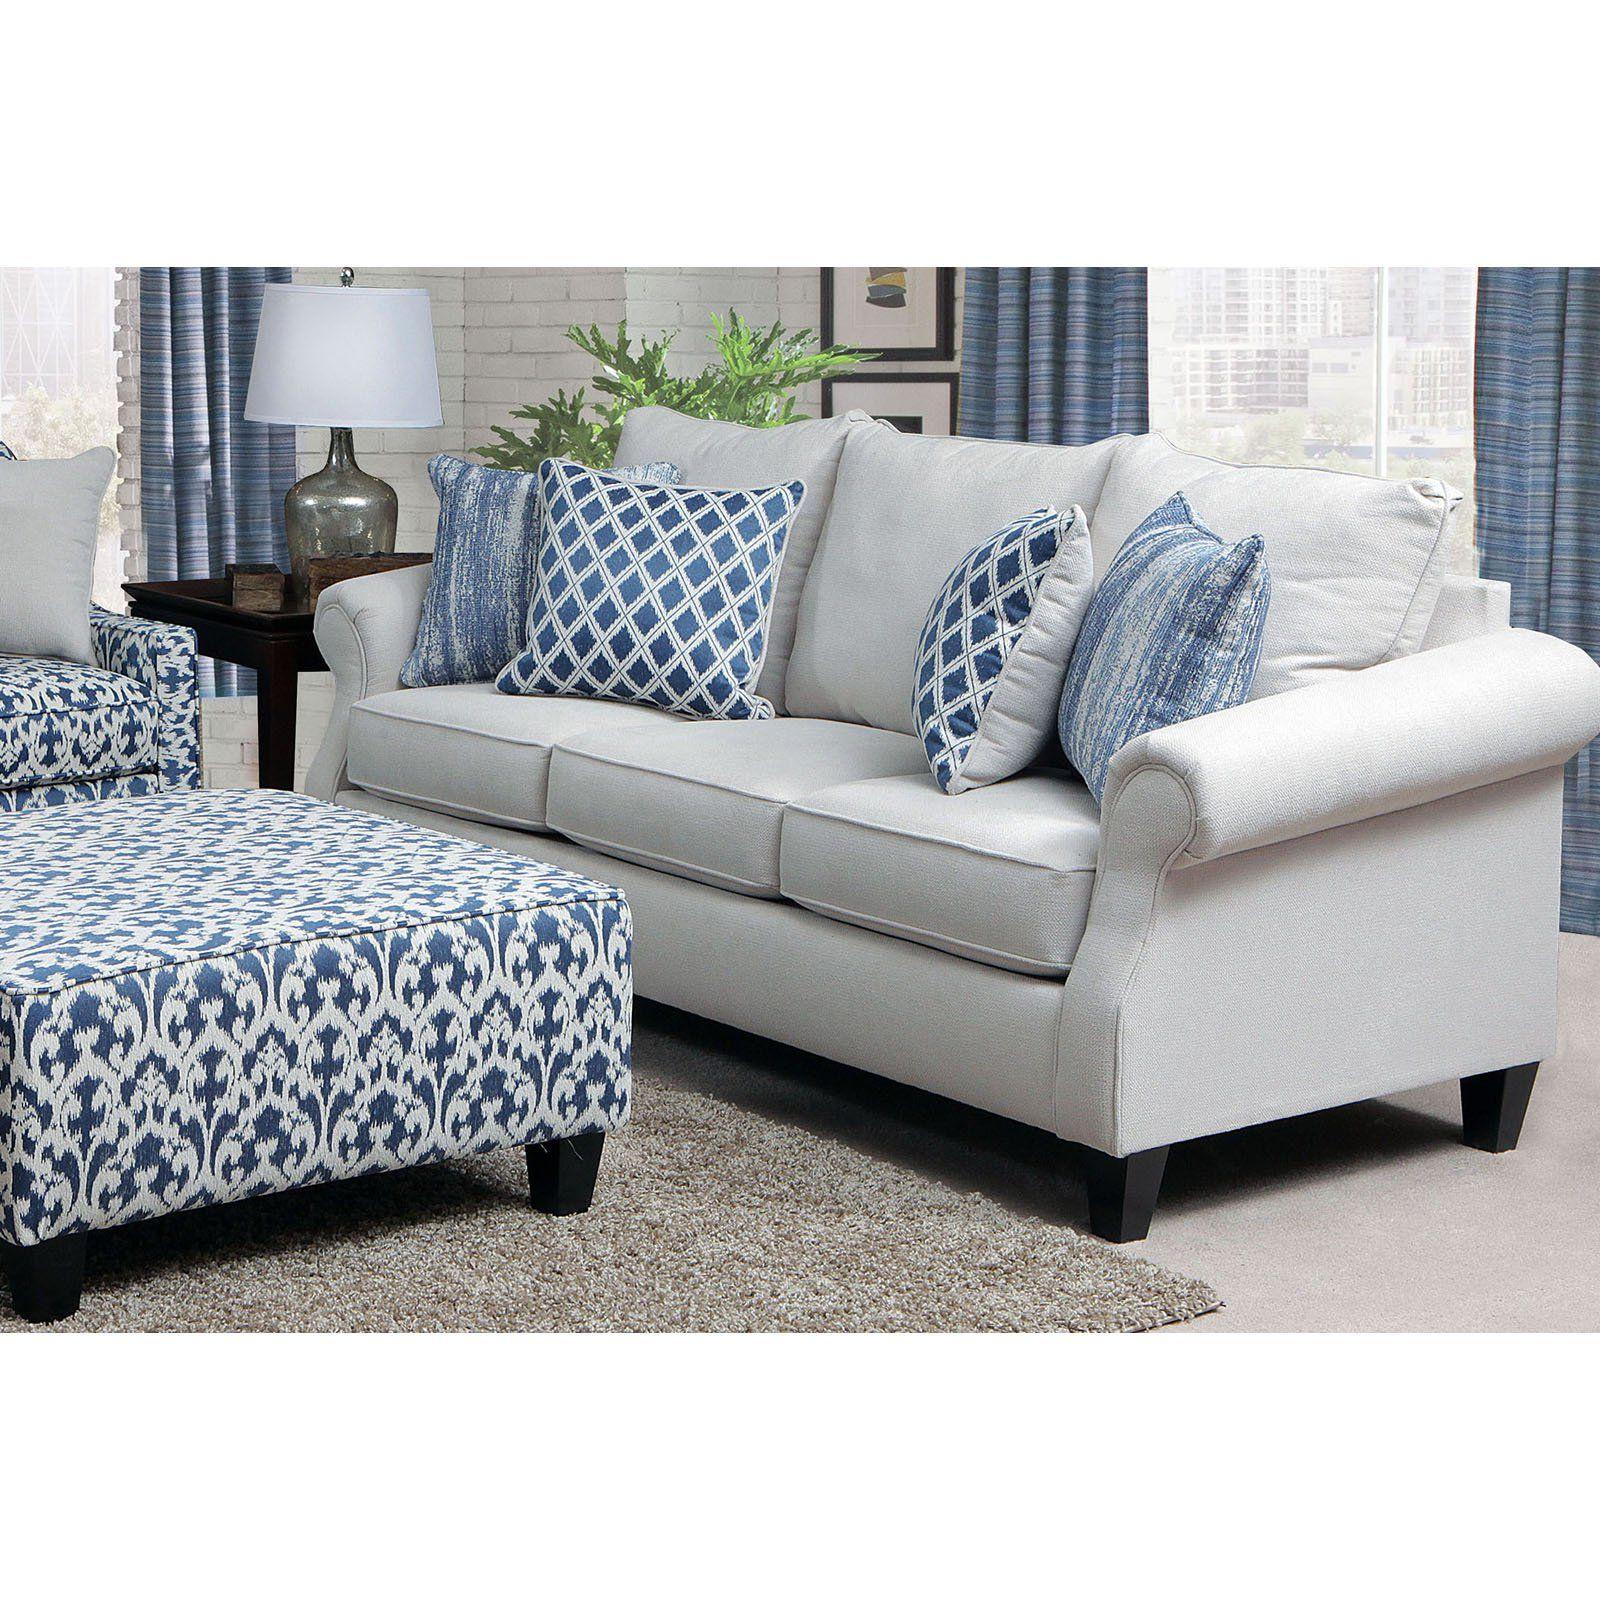 Chelsea Home Furniture Darin Sofa In 2019 Products Sofa